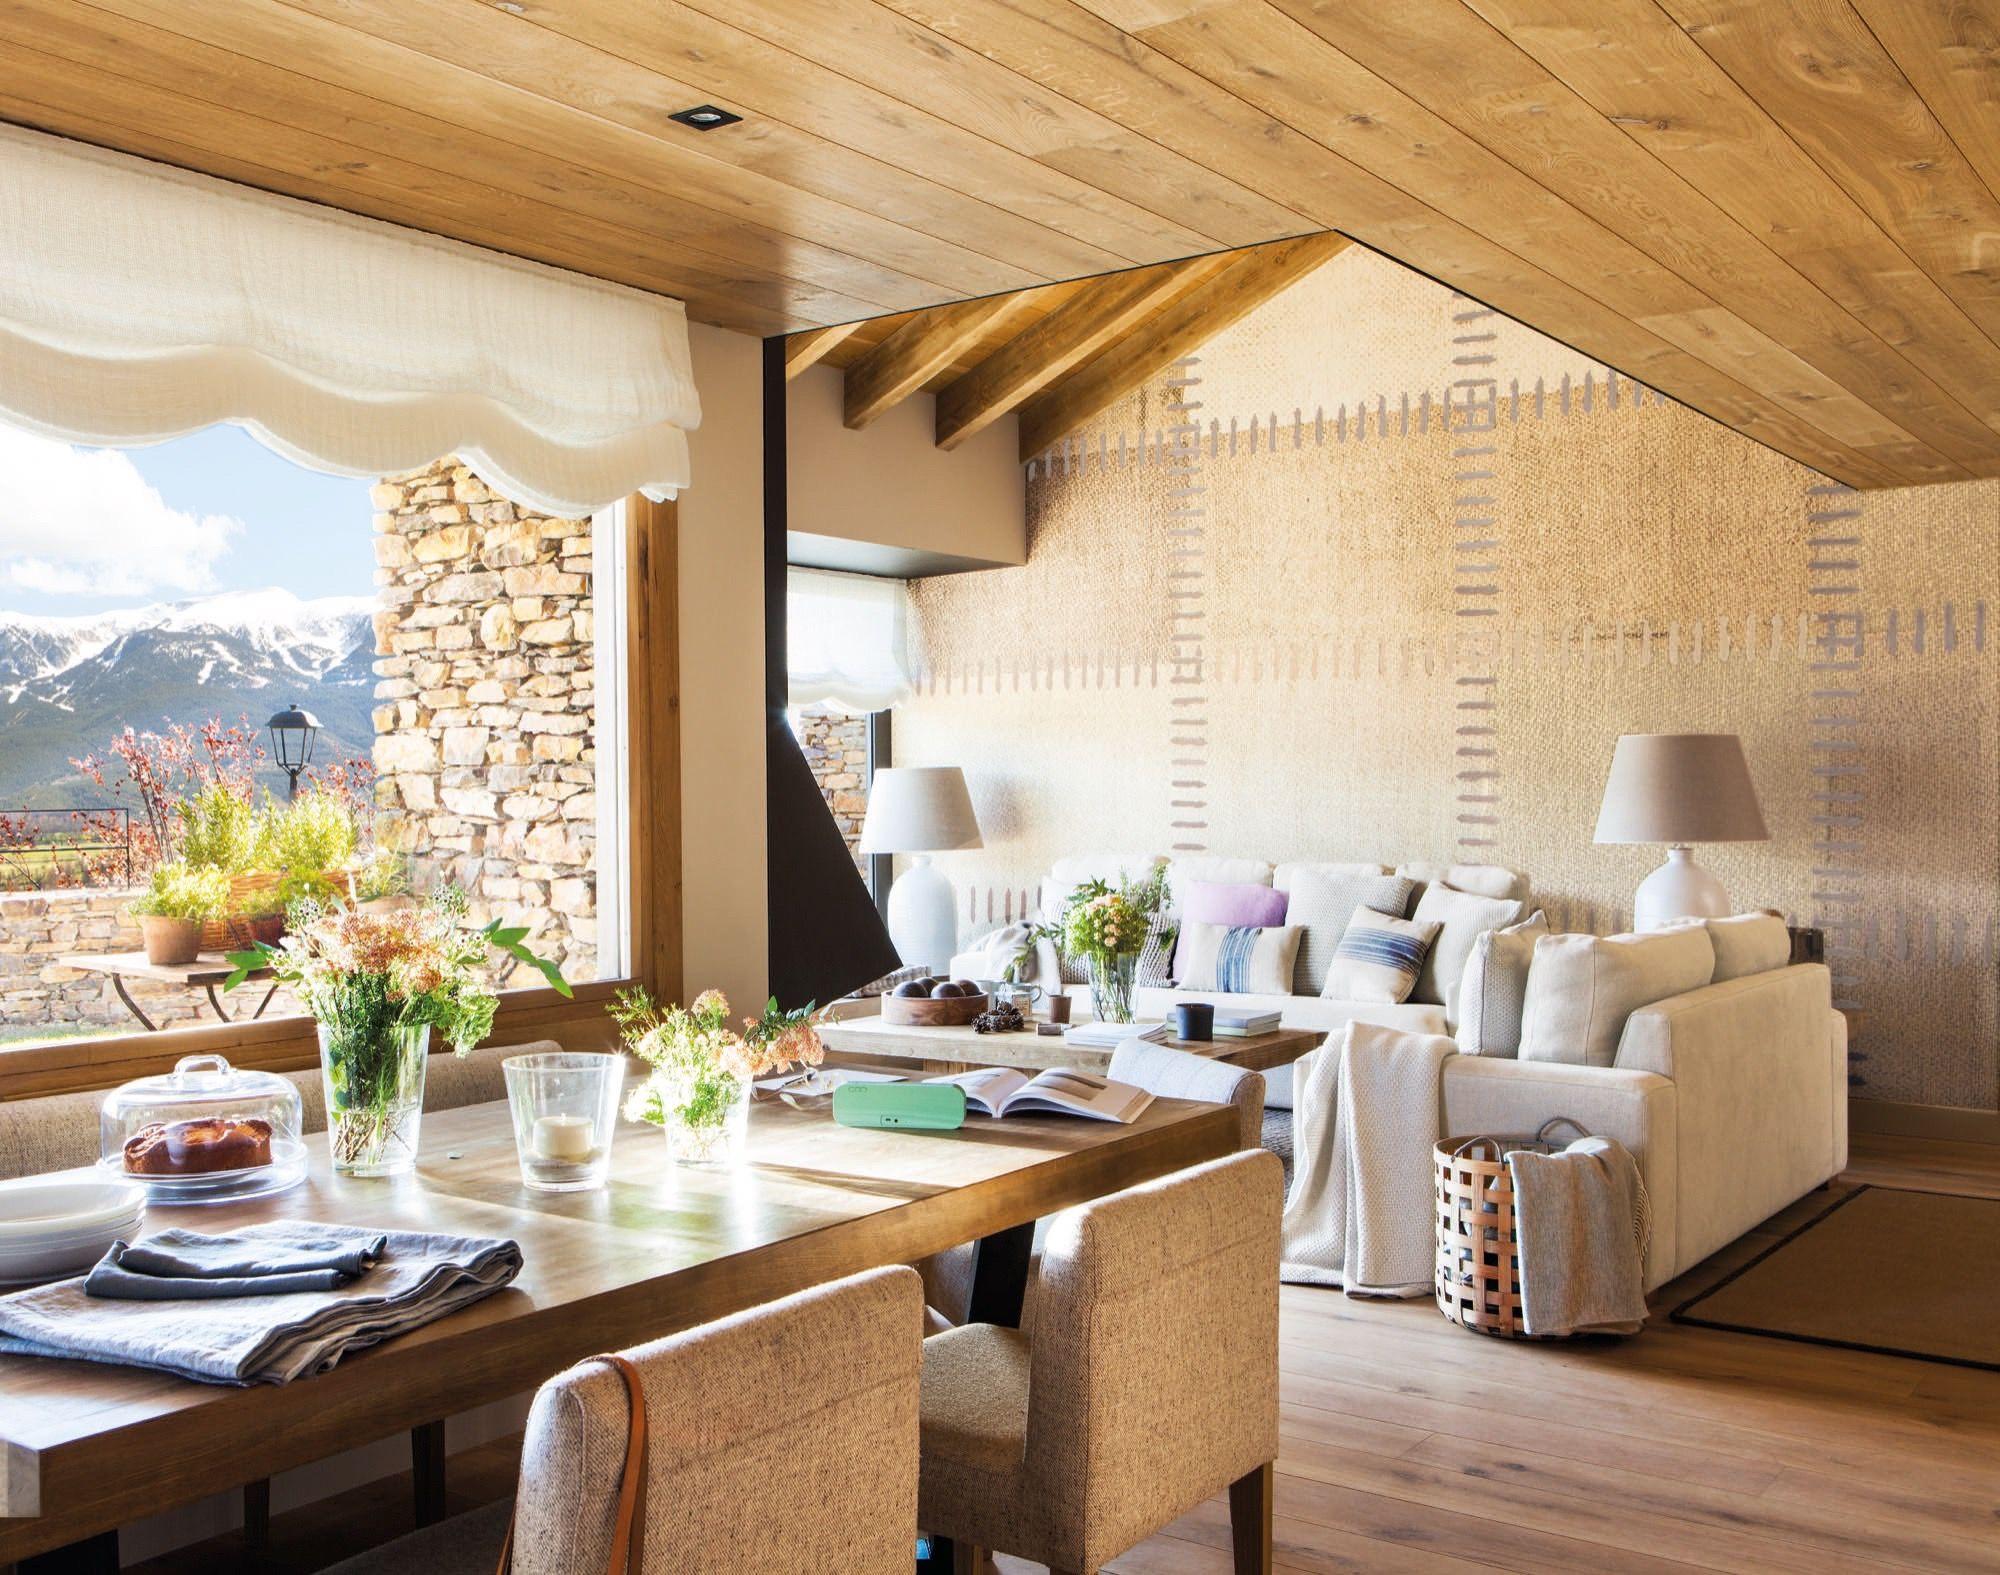 Operaci n pies descalzos interior design casas - Apartamentos de montana ...